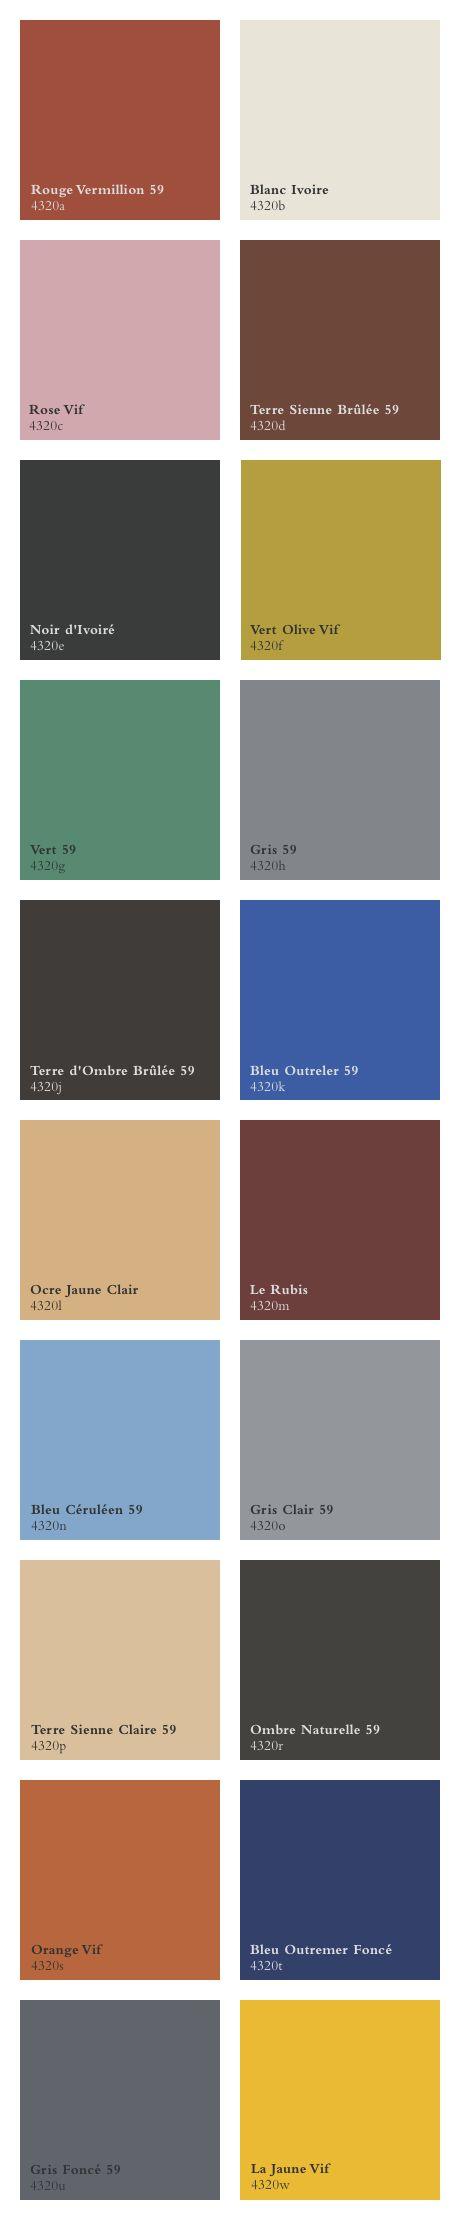 22 best images about color – Sample Rgb Color Chart